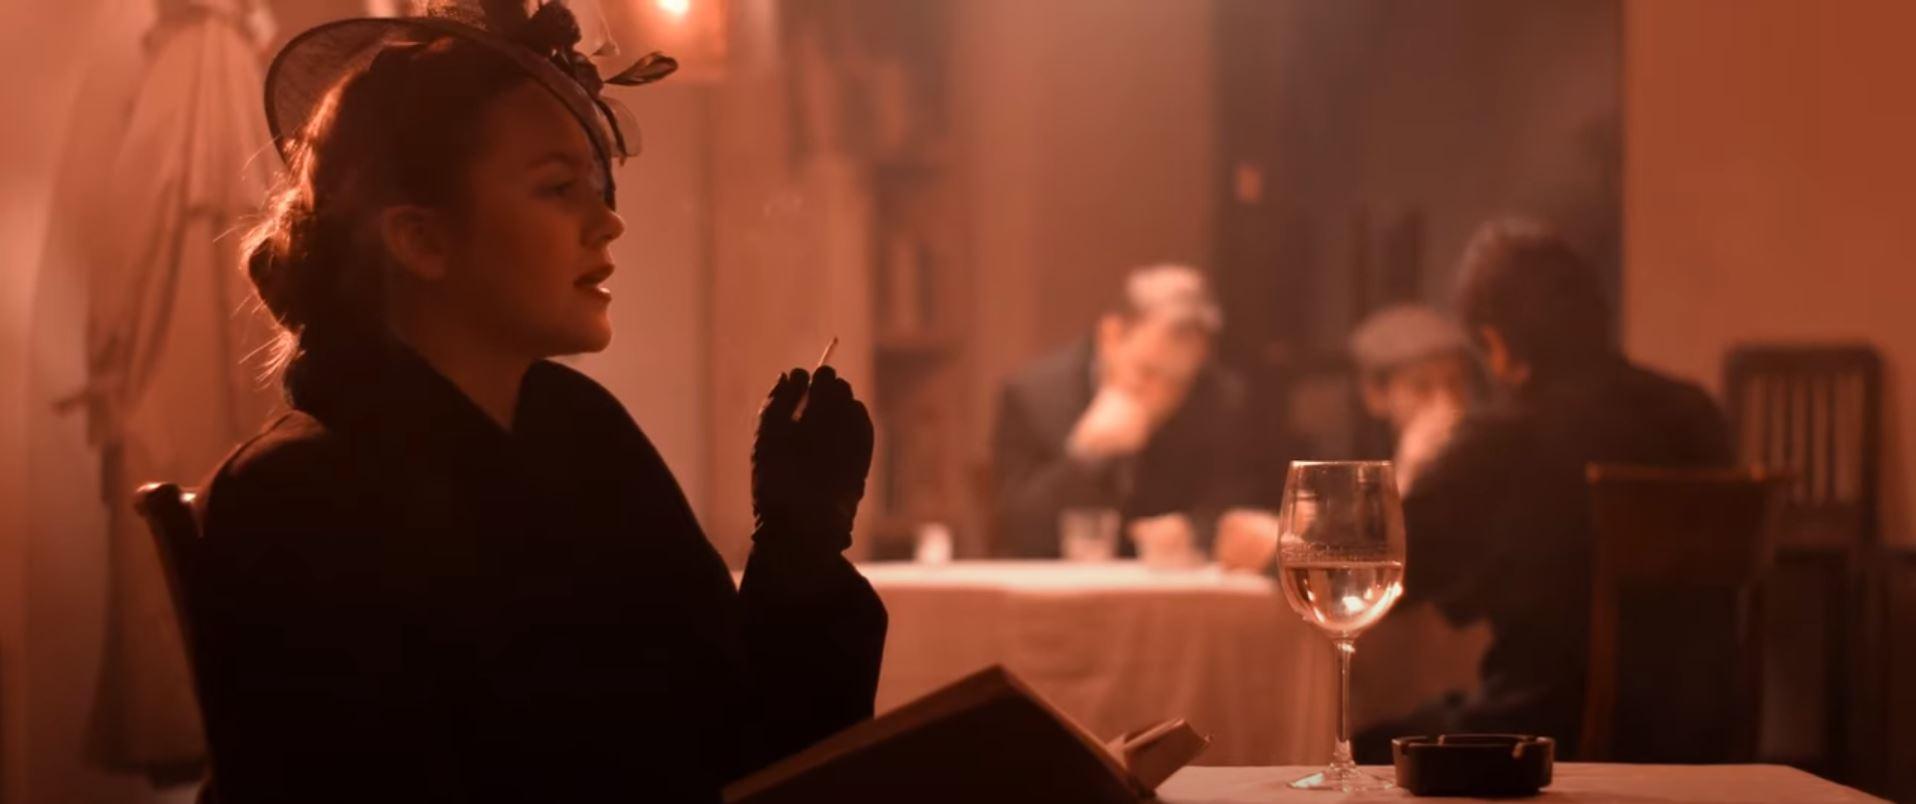 An elegant woman sitting in the bar smoking cigarette in 20s styke